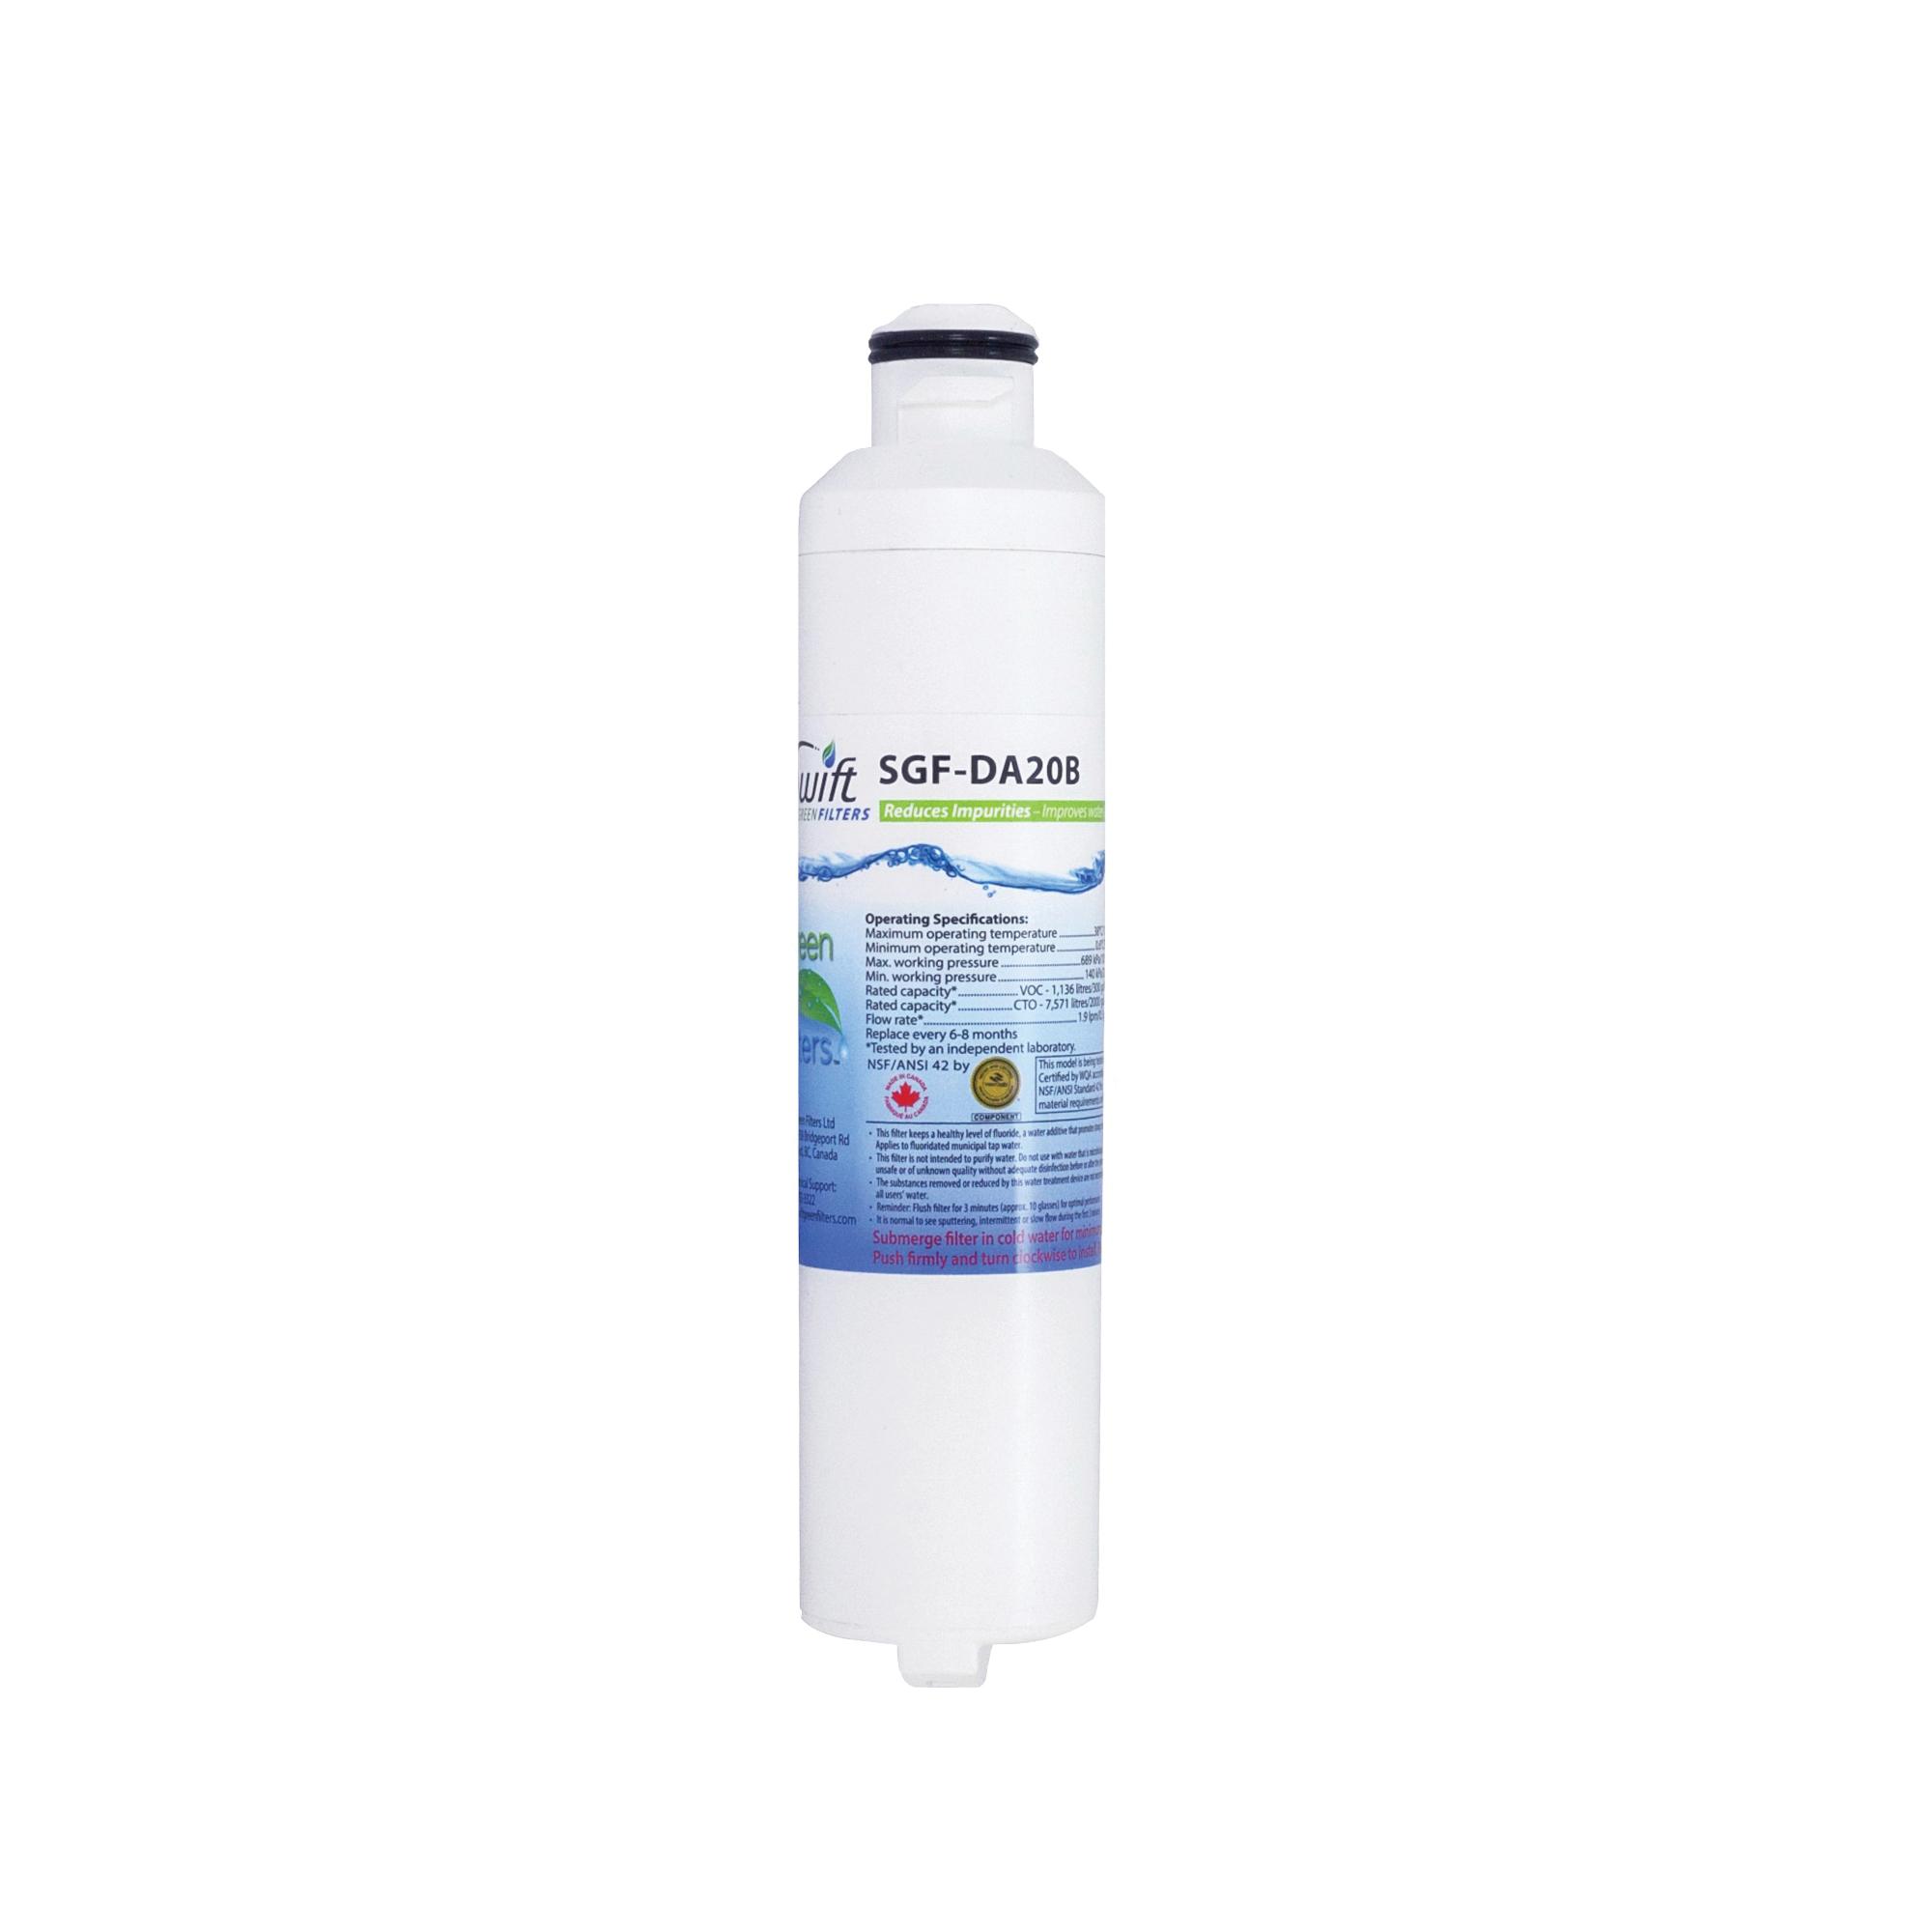 Picture of SWIFT GREEN FILTERS SGF-DA20B Refrigerator Water Filter, 0.5 gpm, 0.5 um Filter